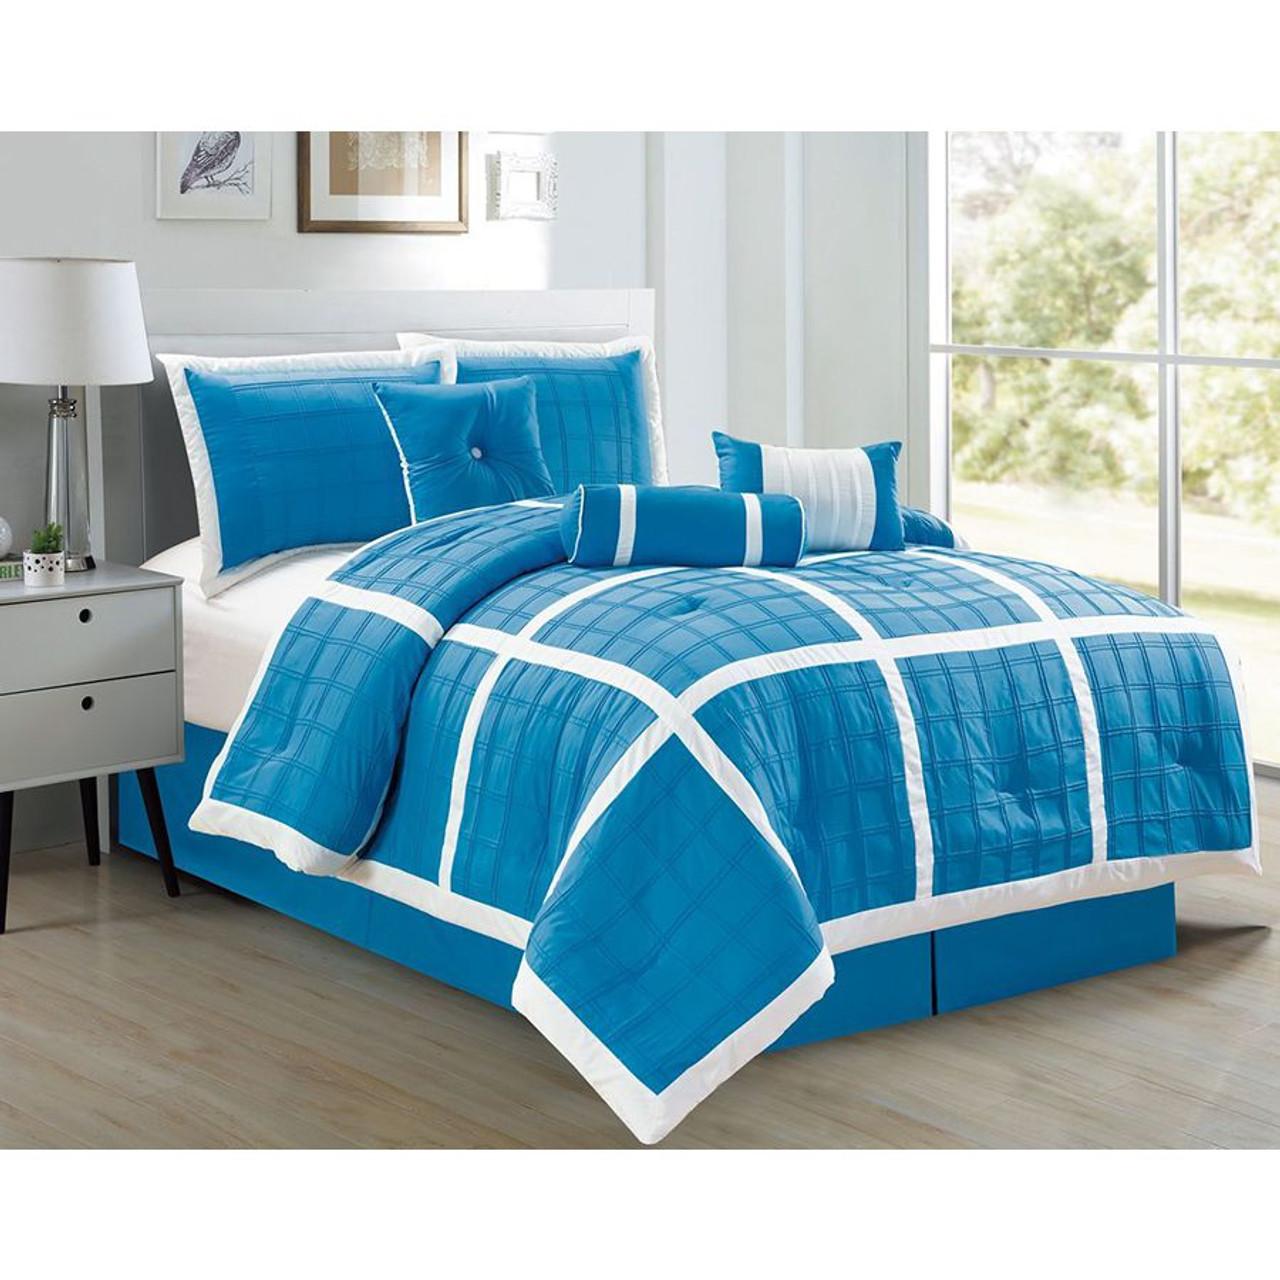 7 pc Microfiber Aqua and White, Checkered Stitch Design Comforter Set